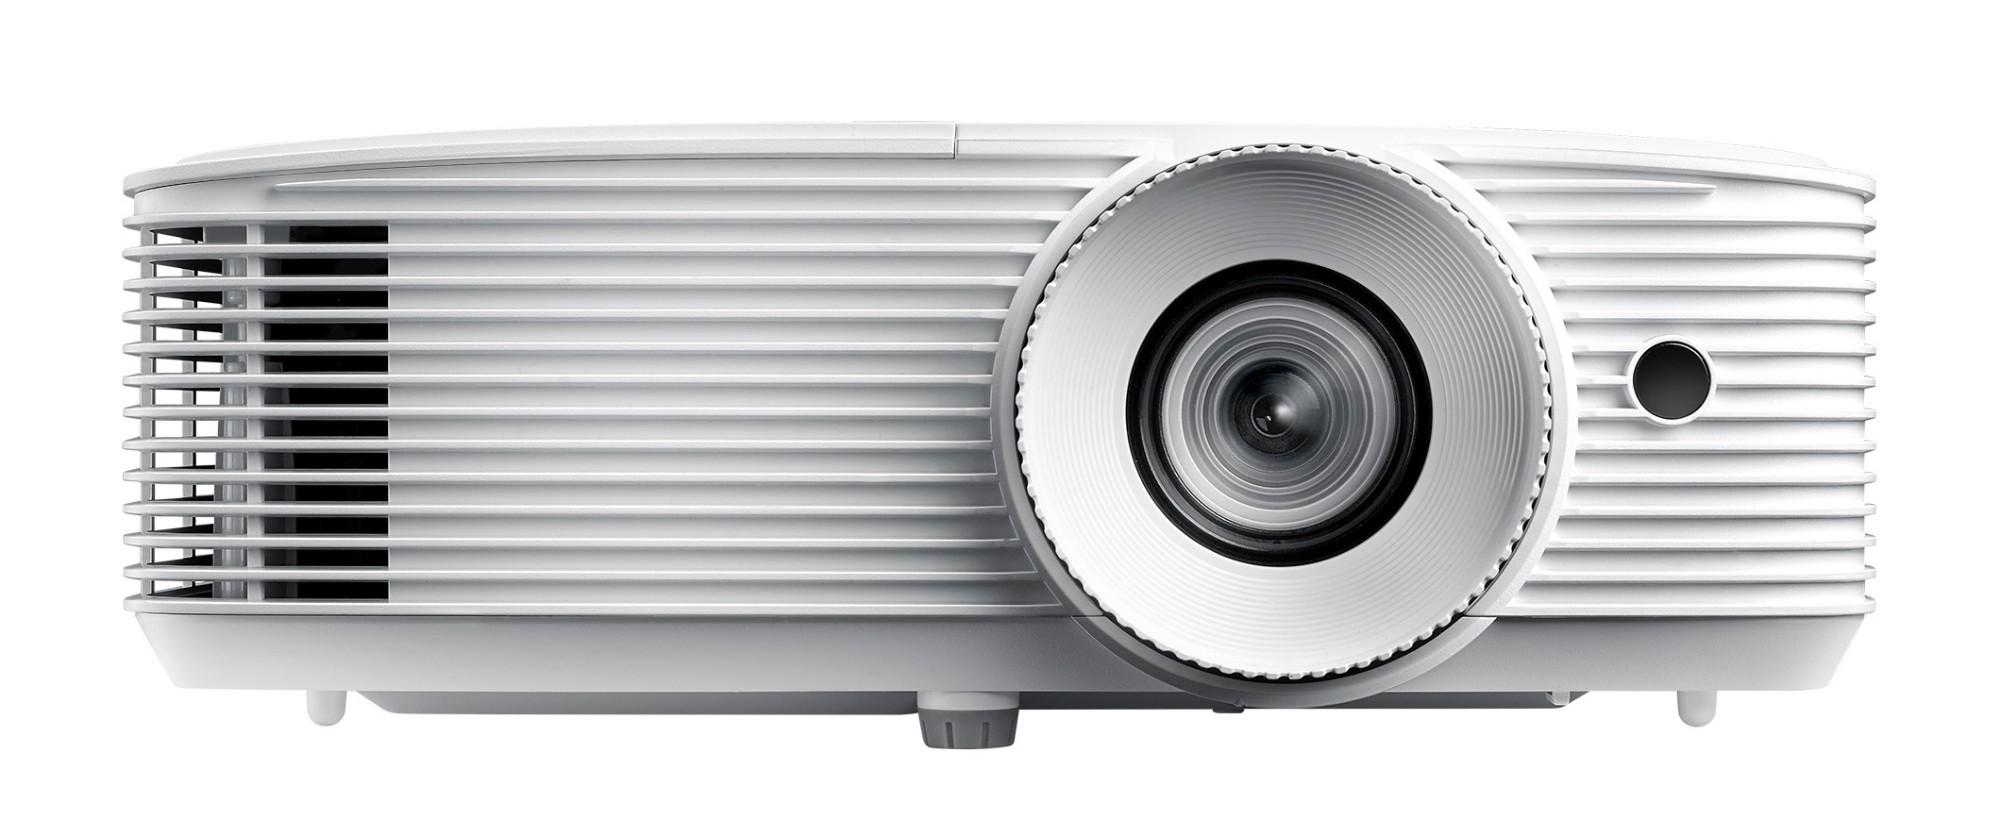 Optoma HD27e data projector 3400 ANSI lumens DLP 1080p (1920x1080) 3D Desktop projector White